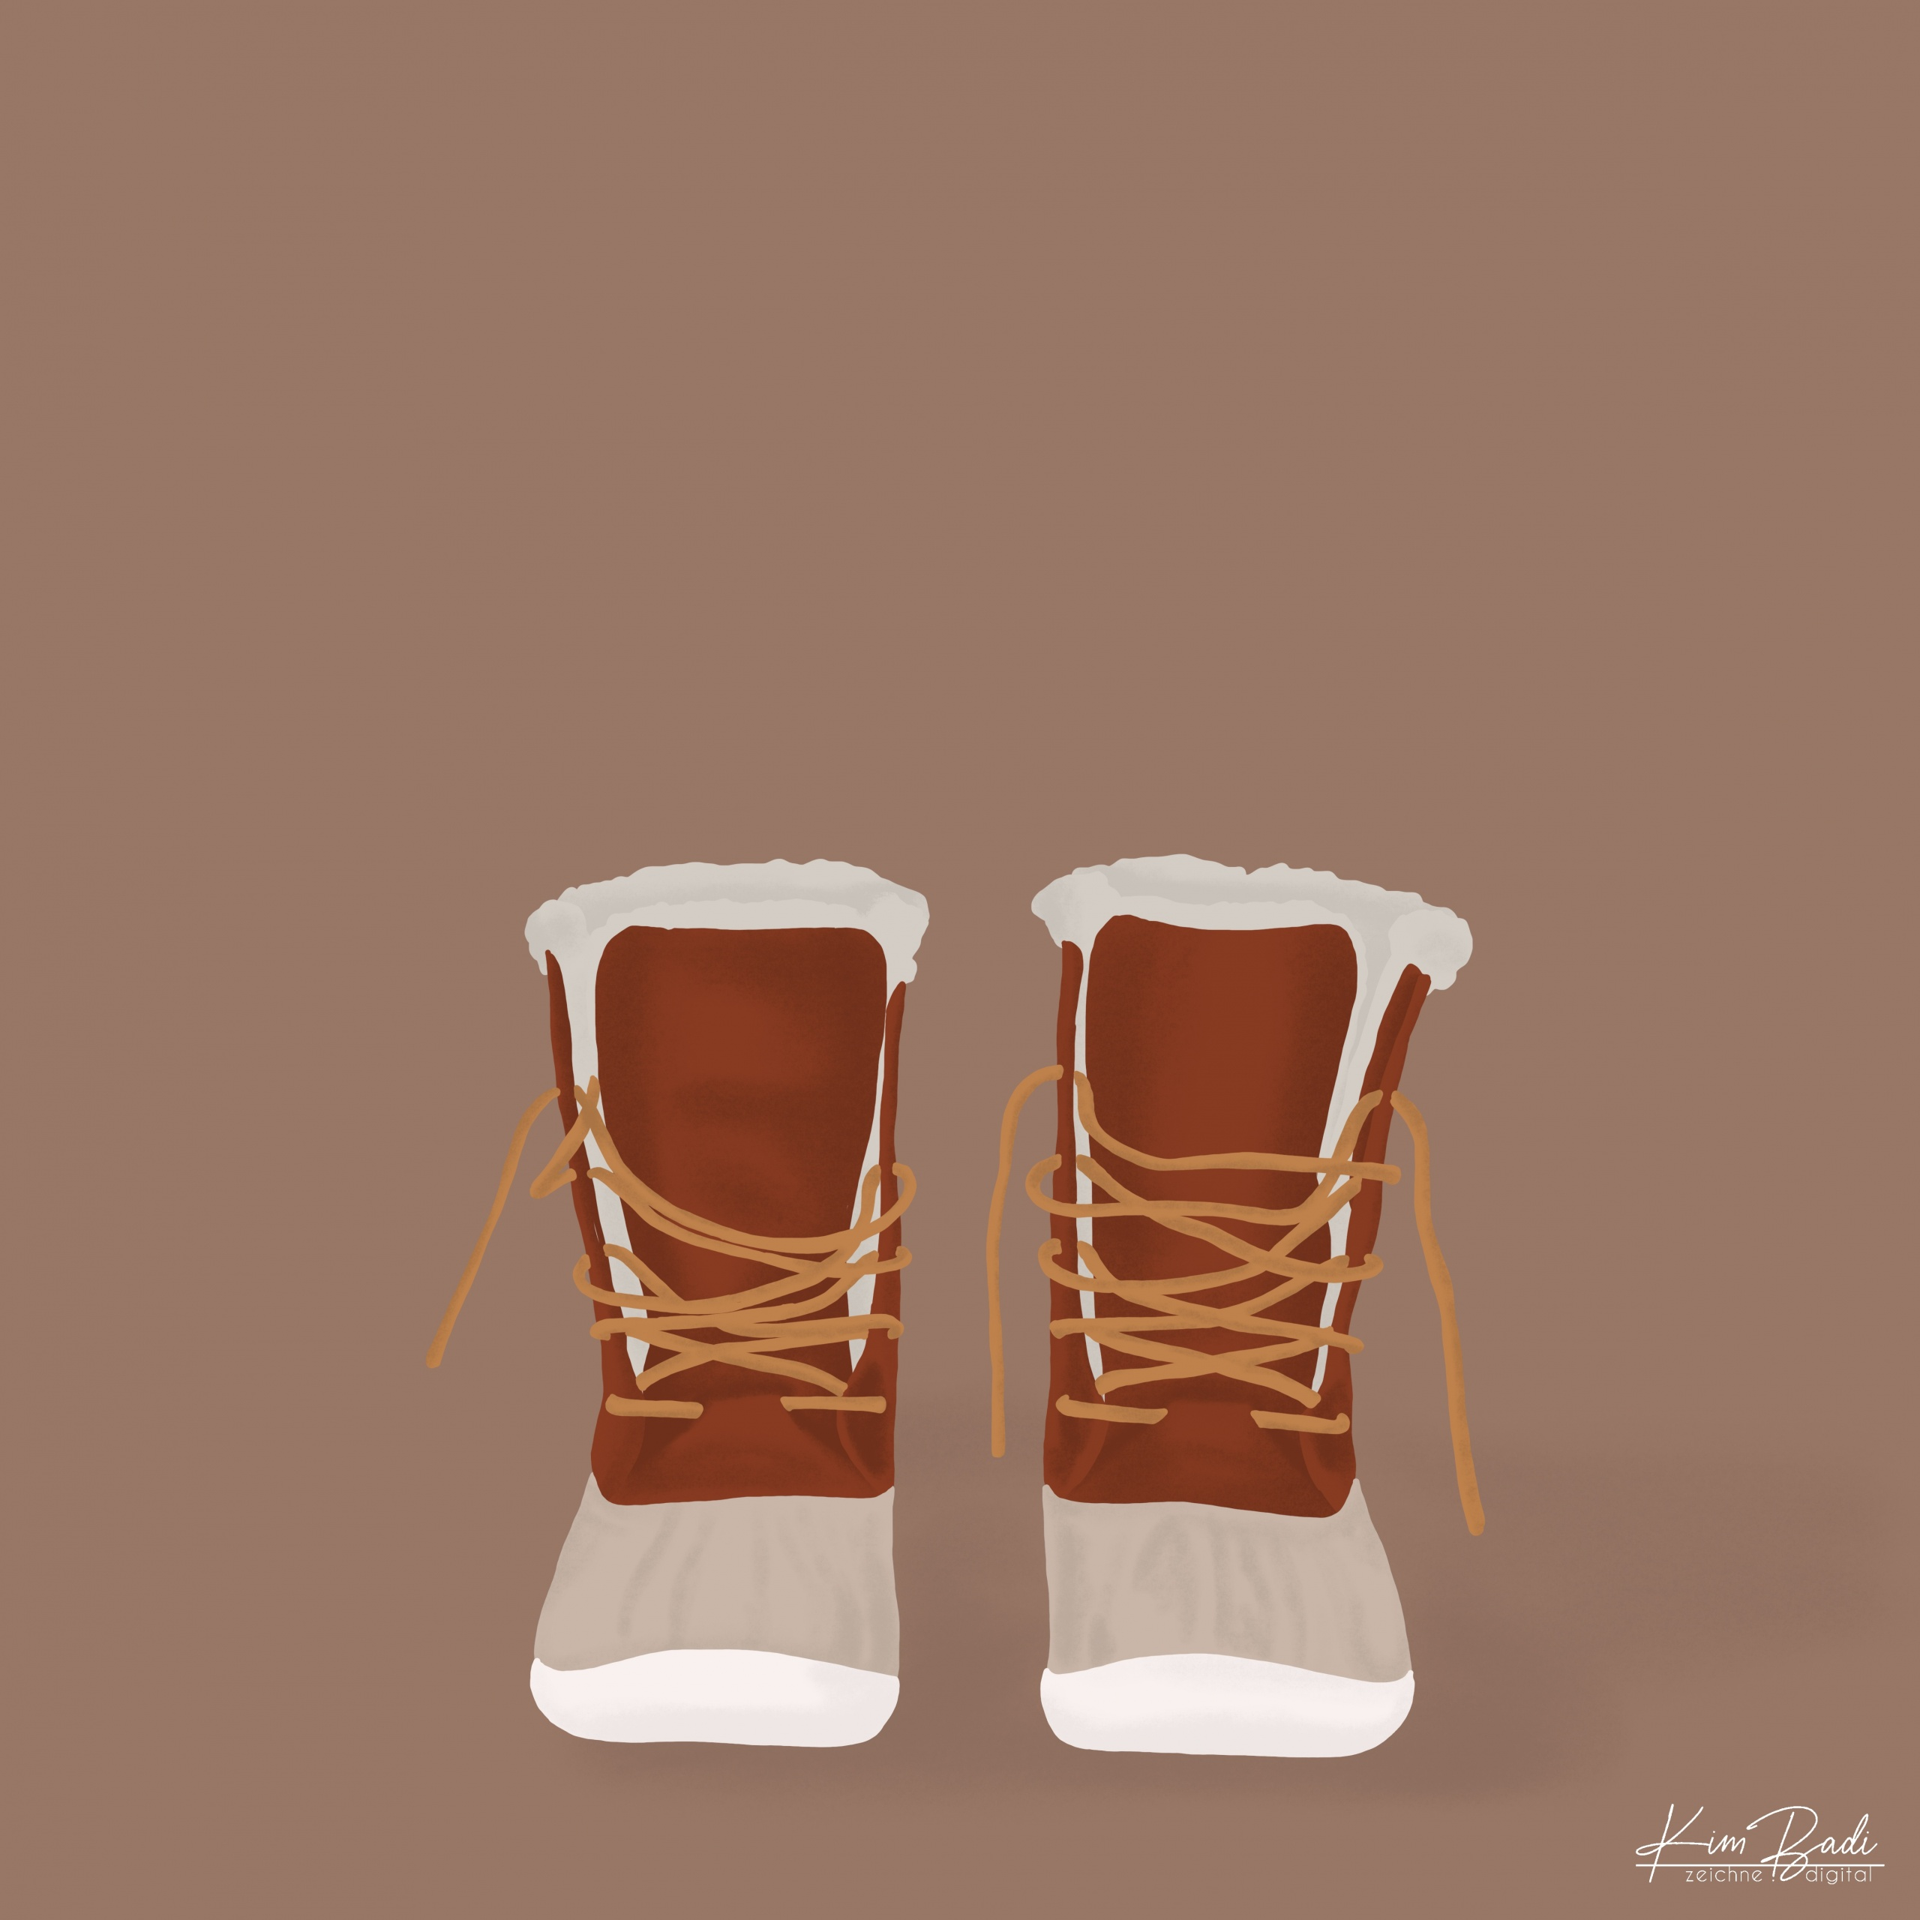 Kim Badi - digitale Kunst - Stiefel auf der Webseite www.kimbadi.com